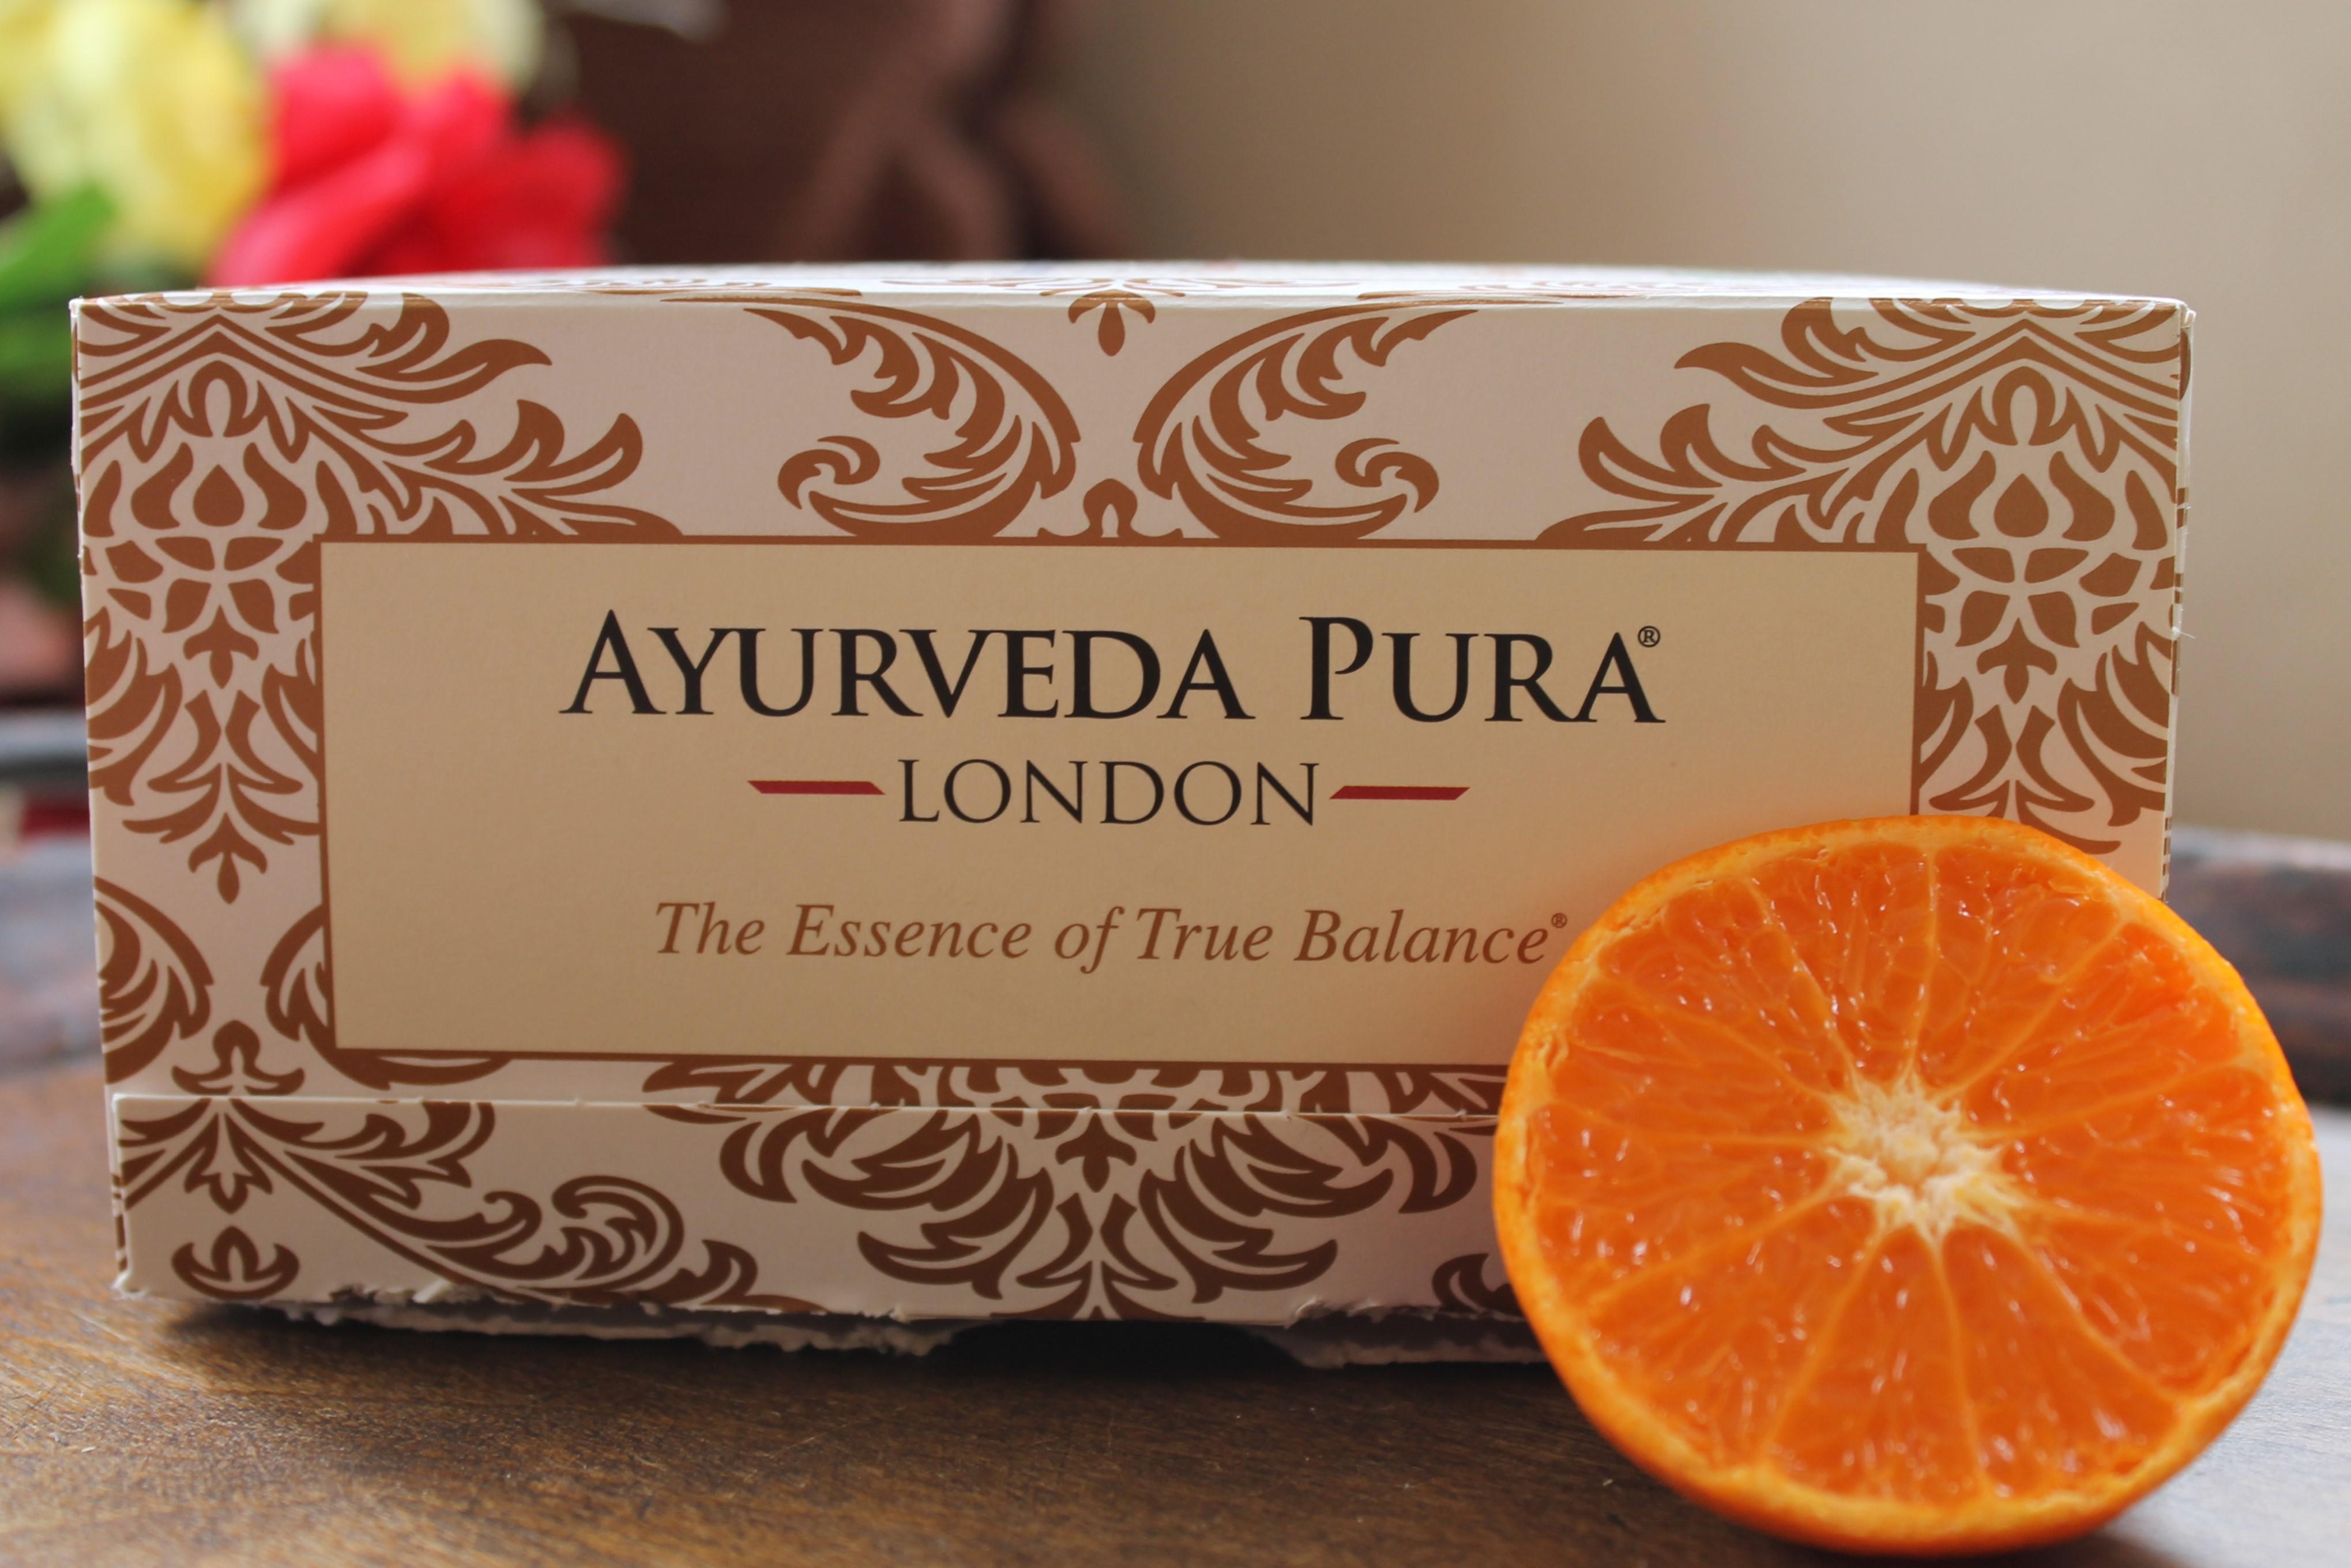 Ayurvedic Tea Selection by Ayurveda Pura London